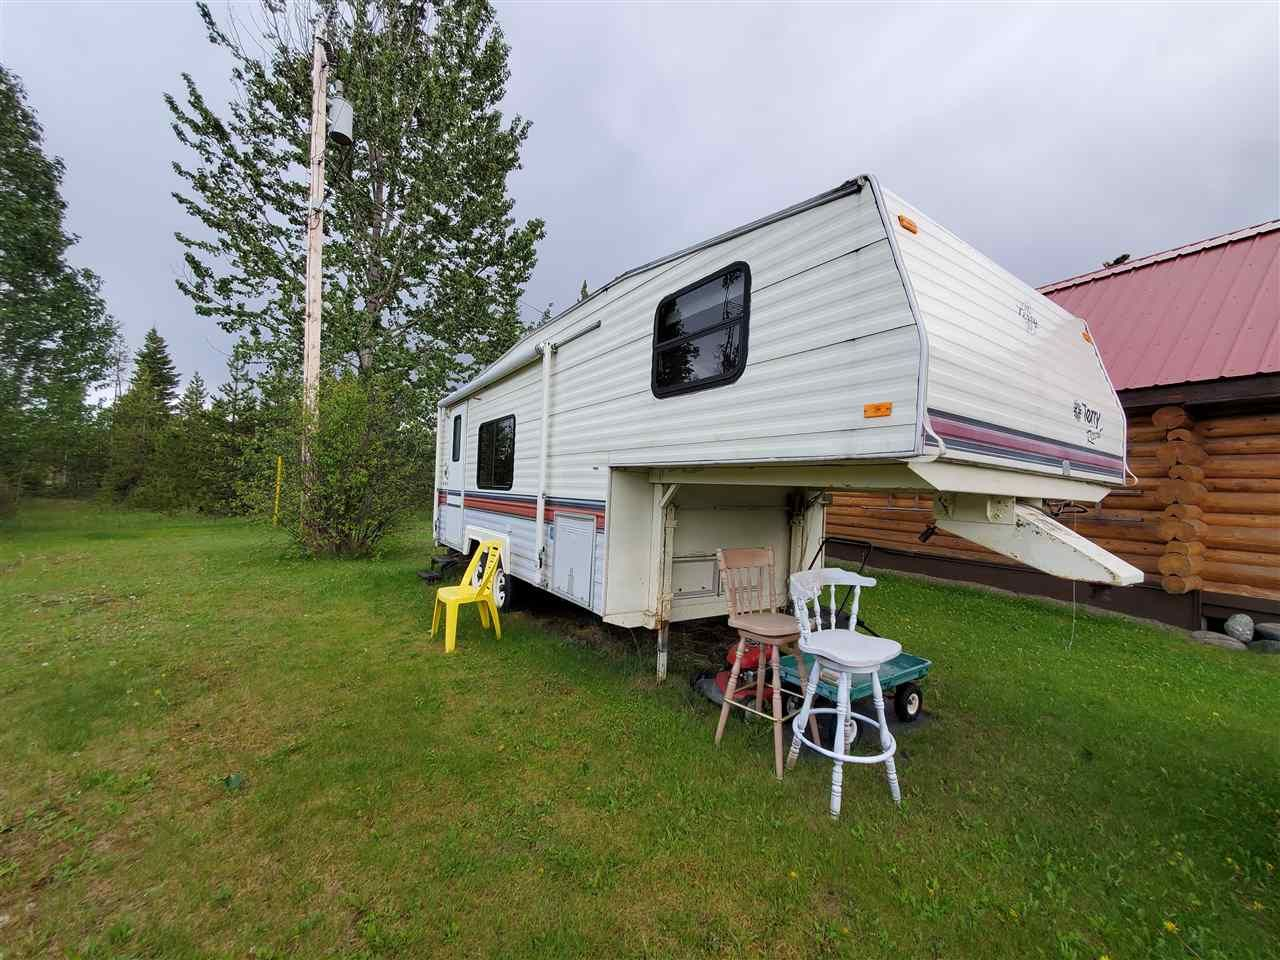 Photo 12: Photos: 9712 NAZKO Road: Bouchie Lake House for sale (Quesnel (Zone 28))  : MLS®# R2592064